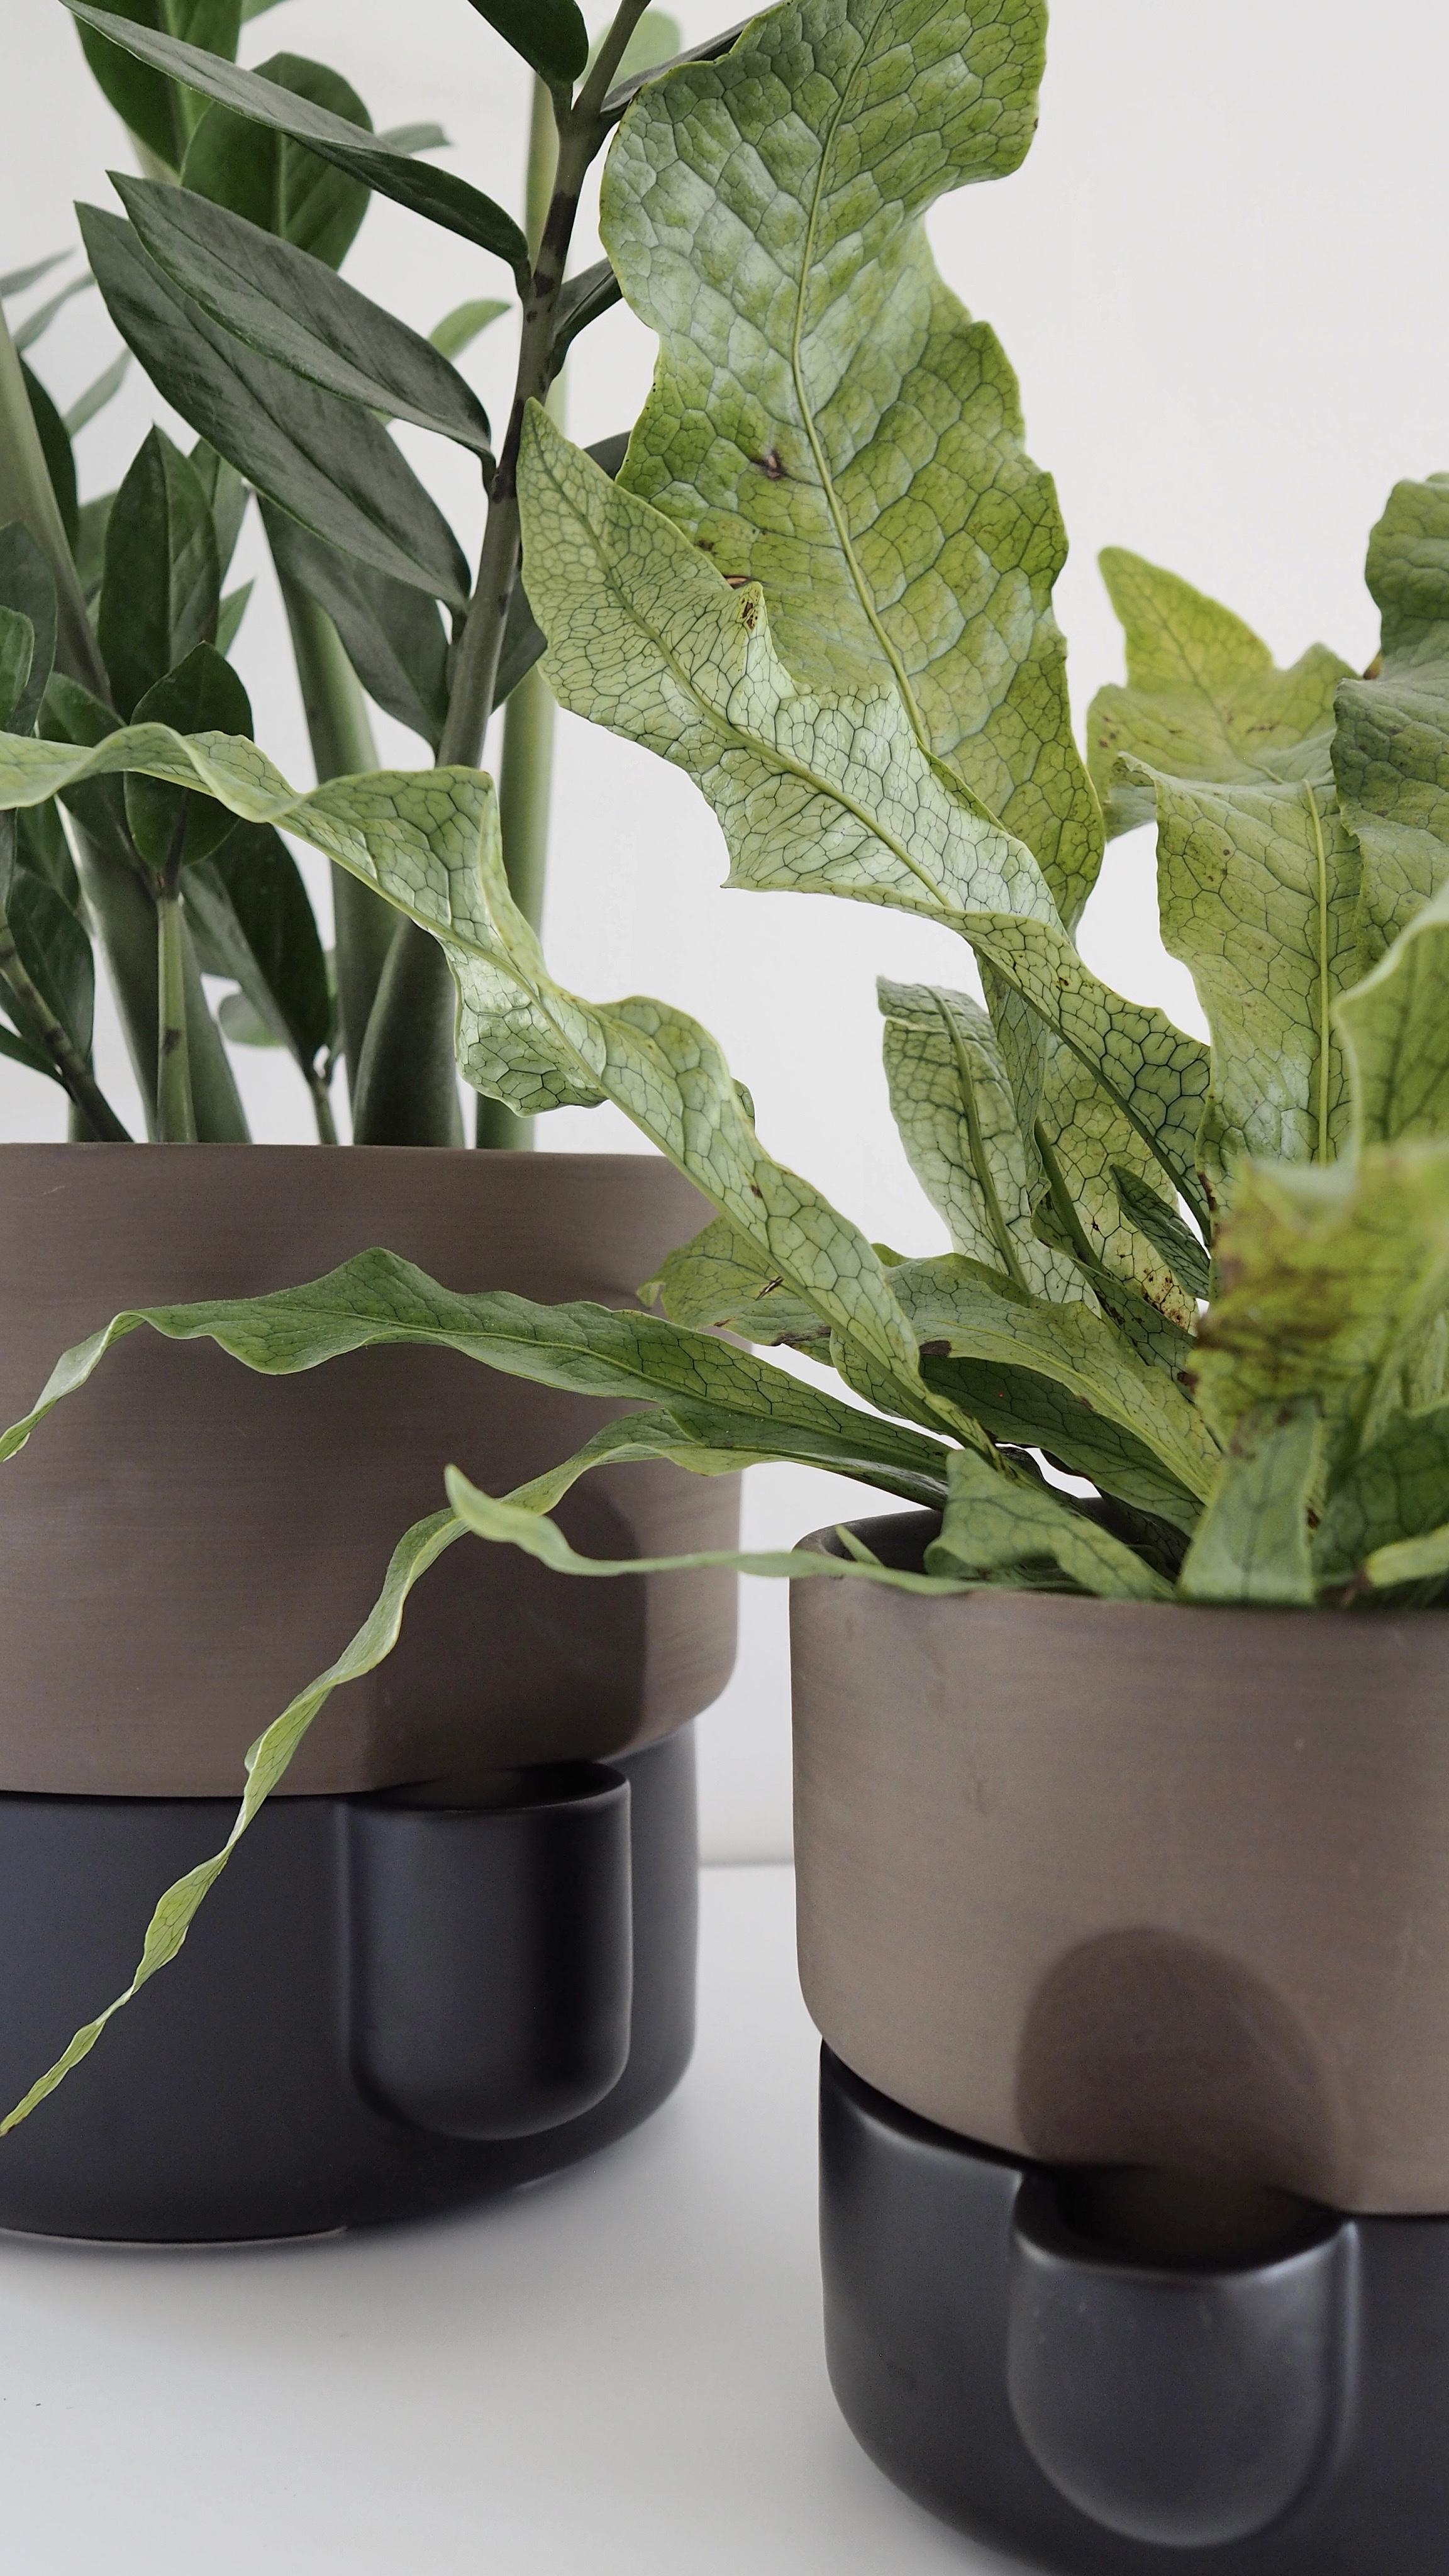 Northern_Oasis_self-watering_flowerpot_2Holiday_Care_for_Houseplants_Nicola_Capper.jpg